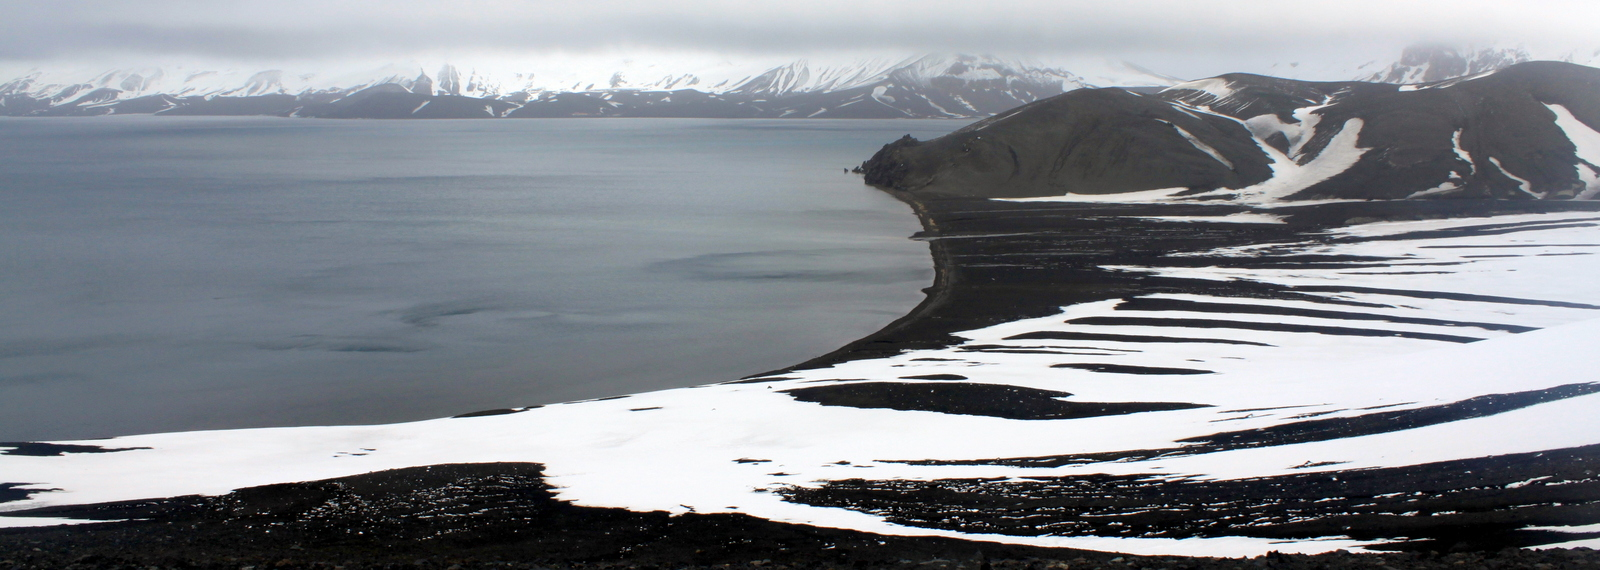 Antarctica, Deception Island, Telephone Bay